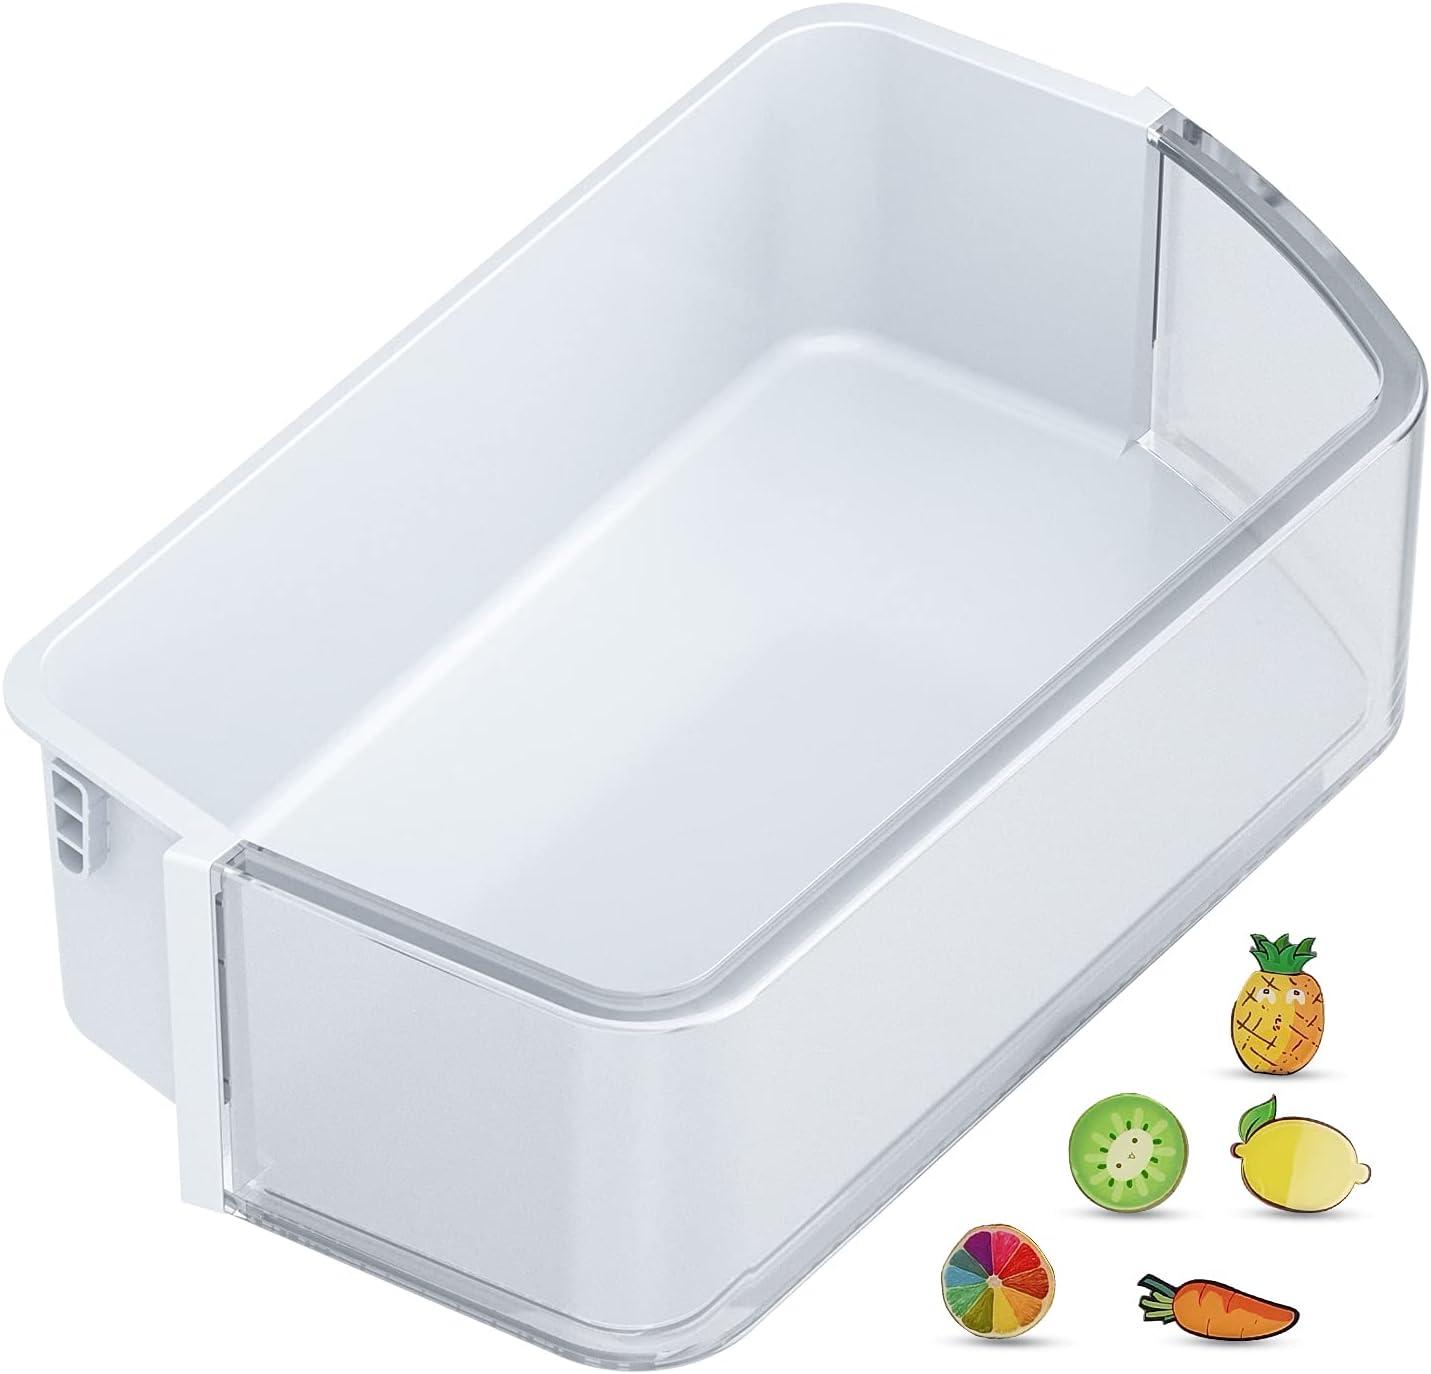 Rimous DA97-12650A Refrigerator Door Shelf Basket Righ Bin Weekly Gifts update